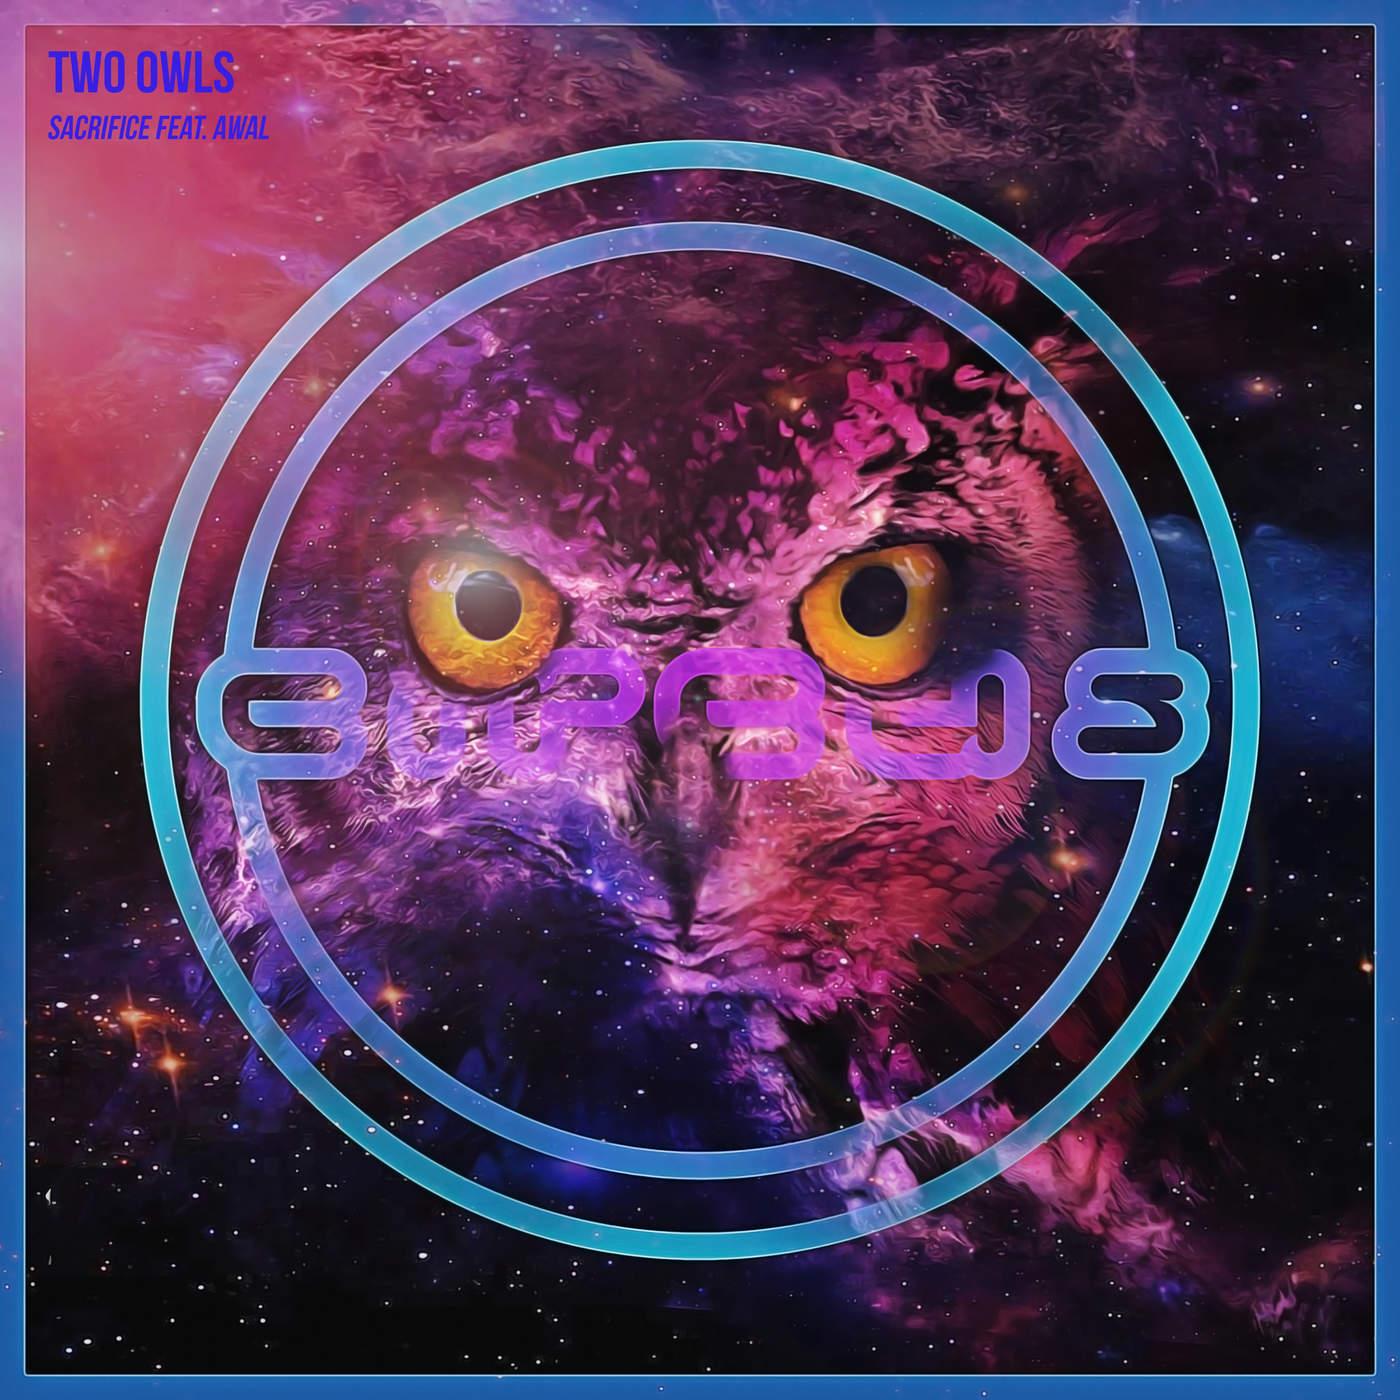 Sacrifice (Single) - Two Owls - Awal